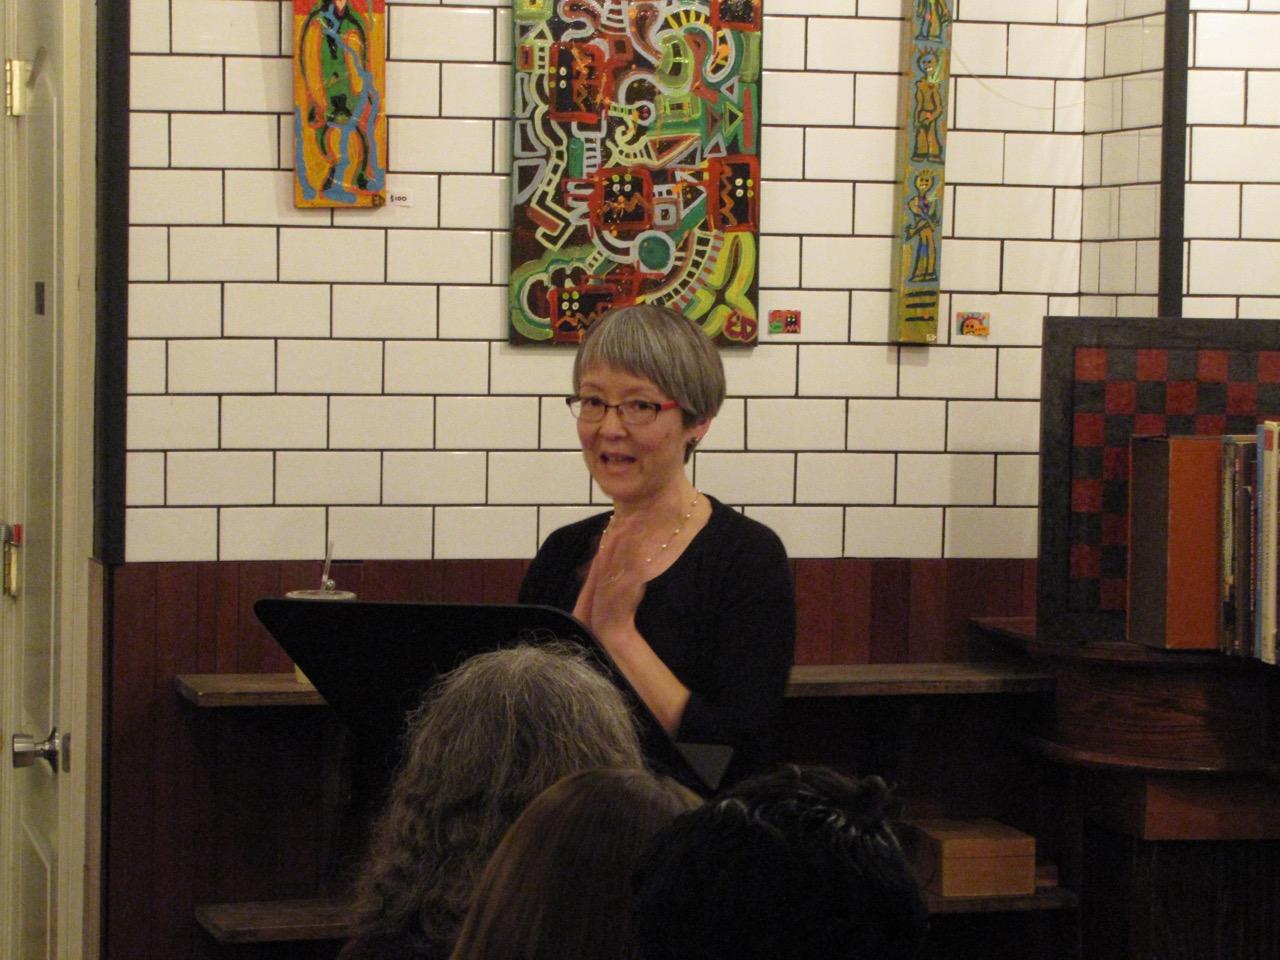 Naomi J. Williams